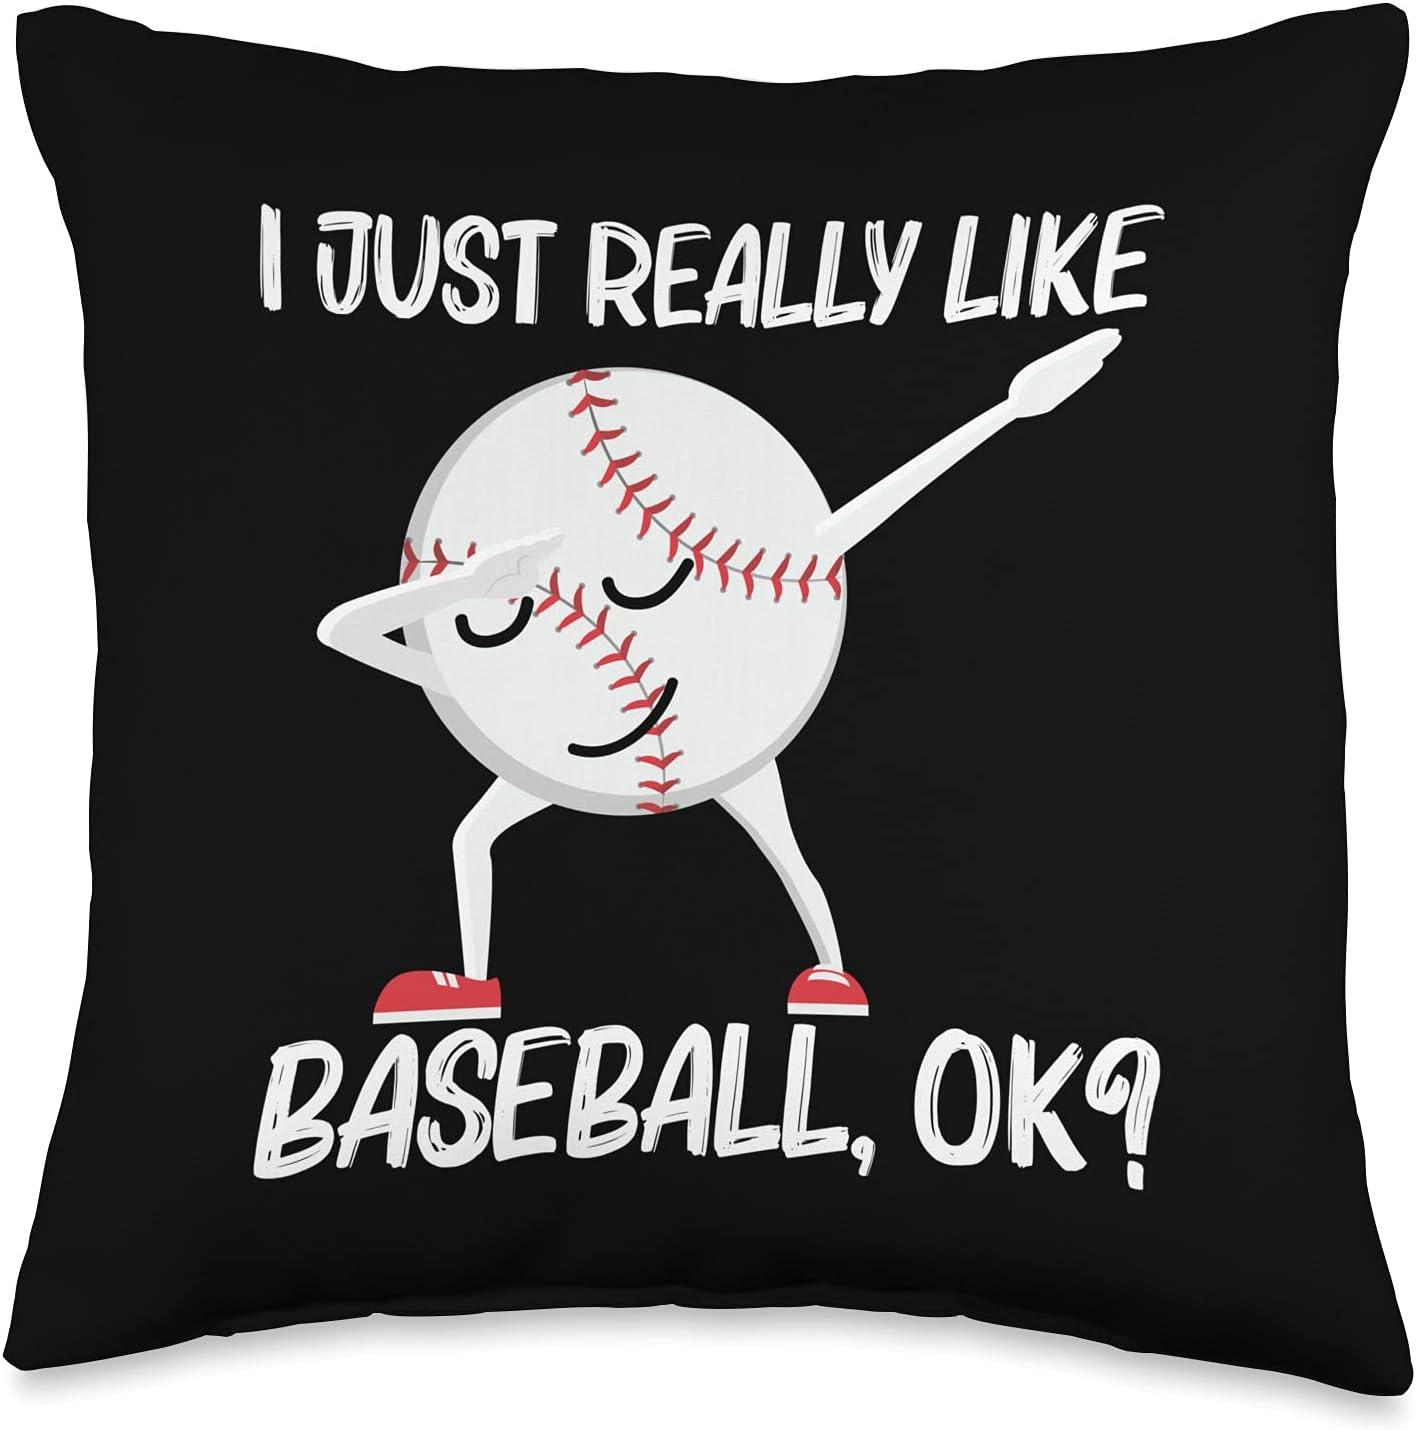 Cute Baseball Selling Gift Base Funny Fielding Athlete Clothing